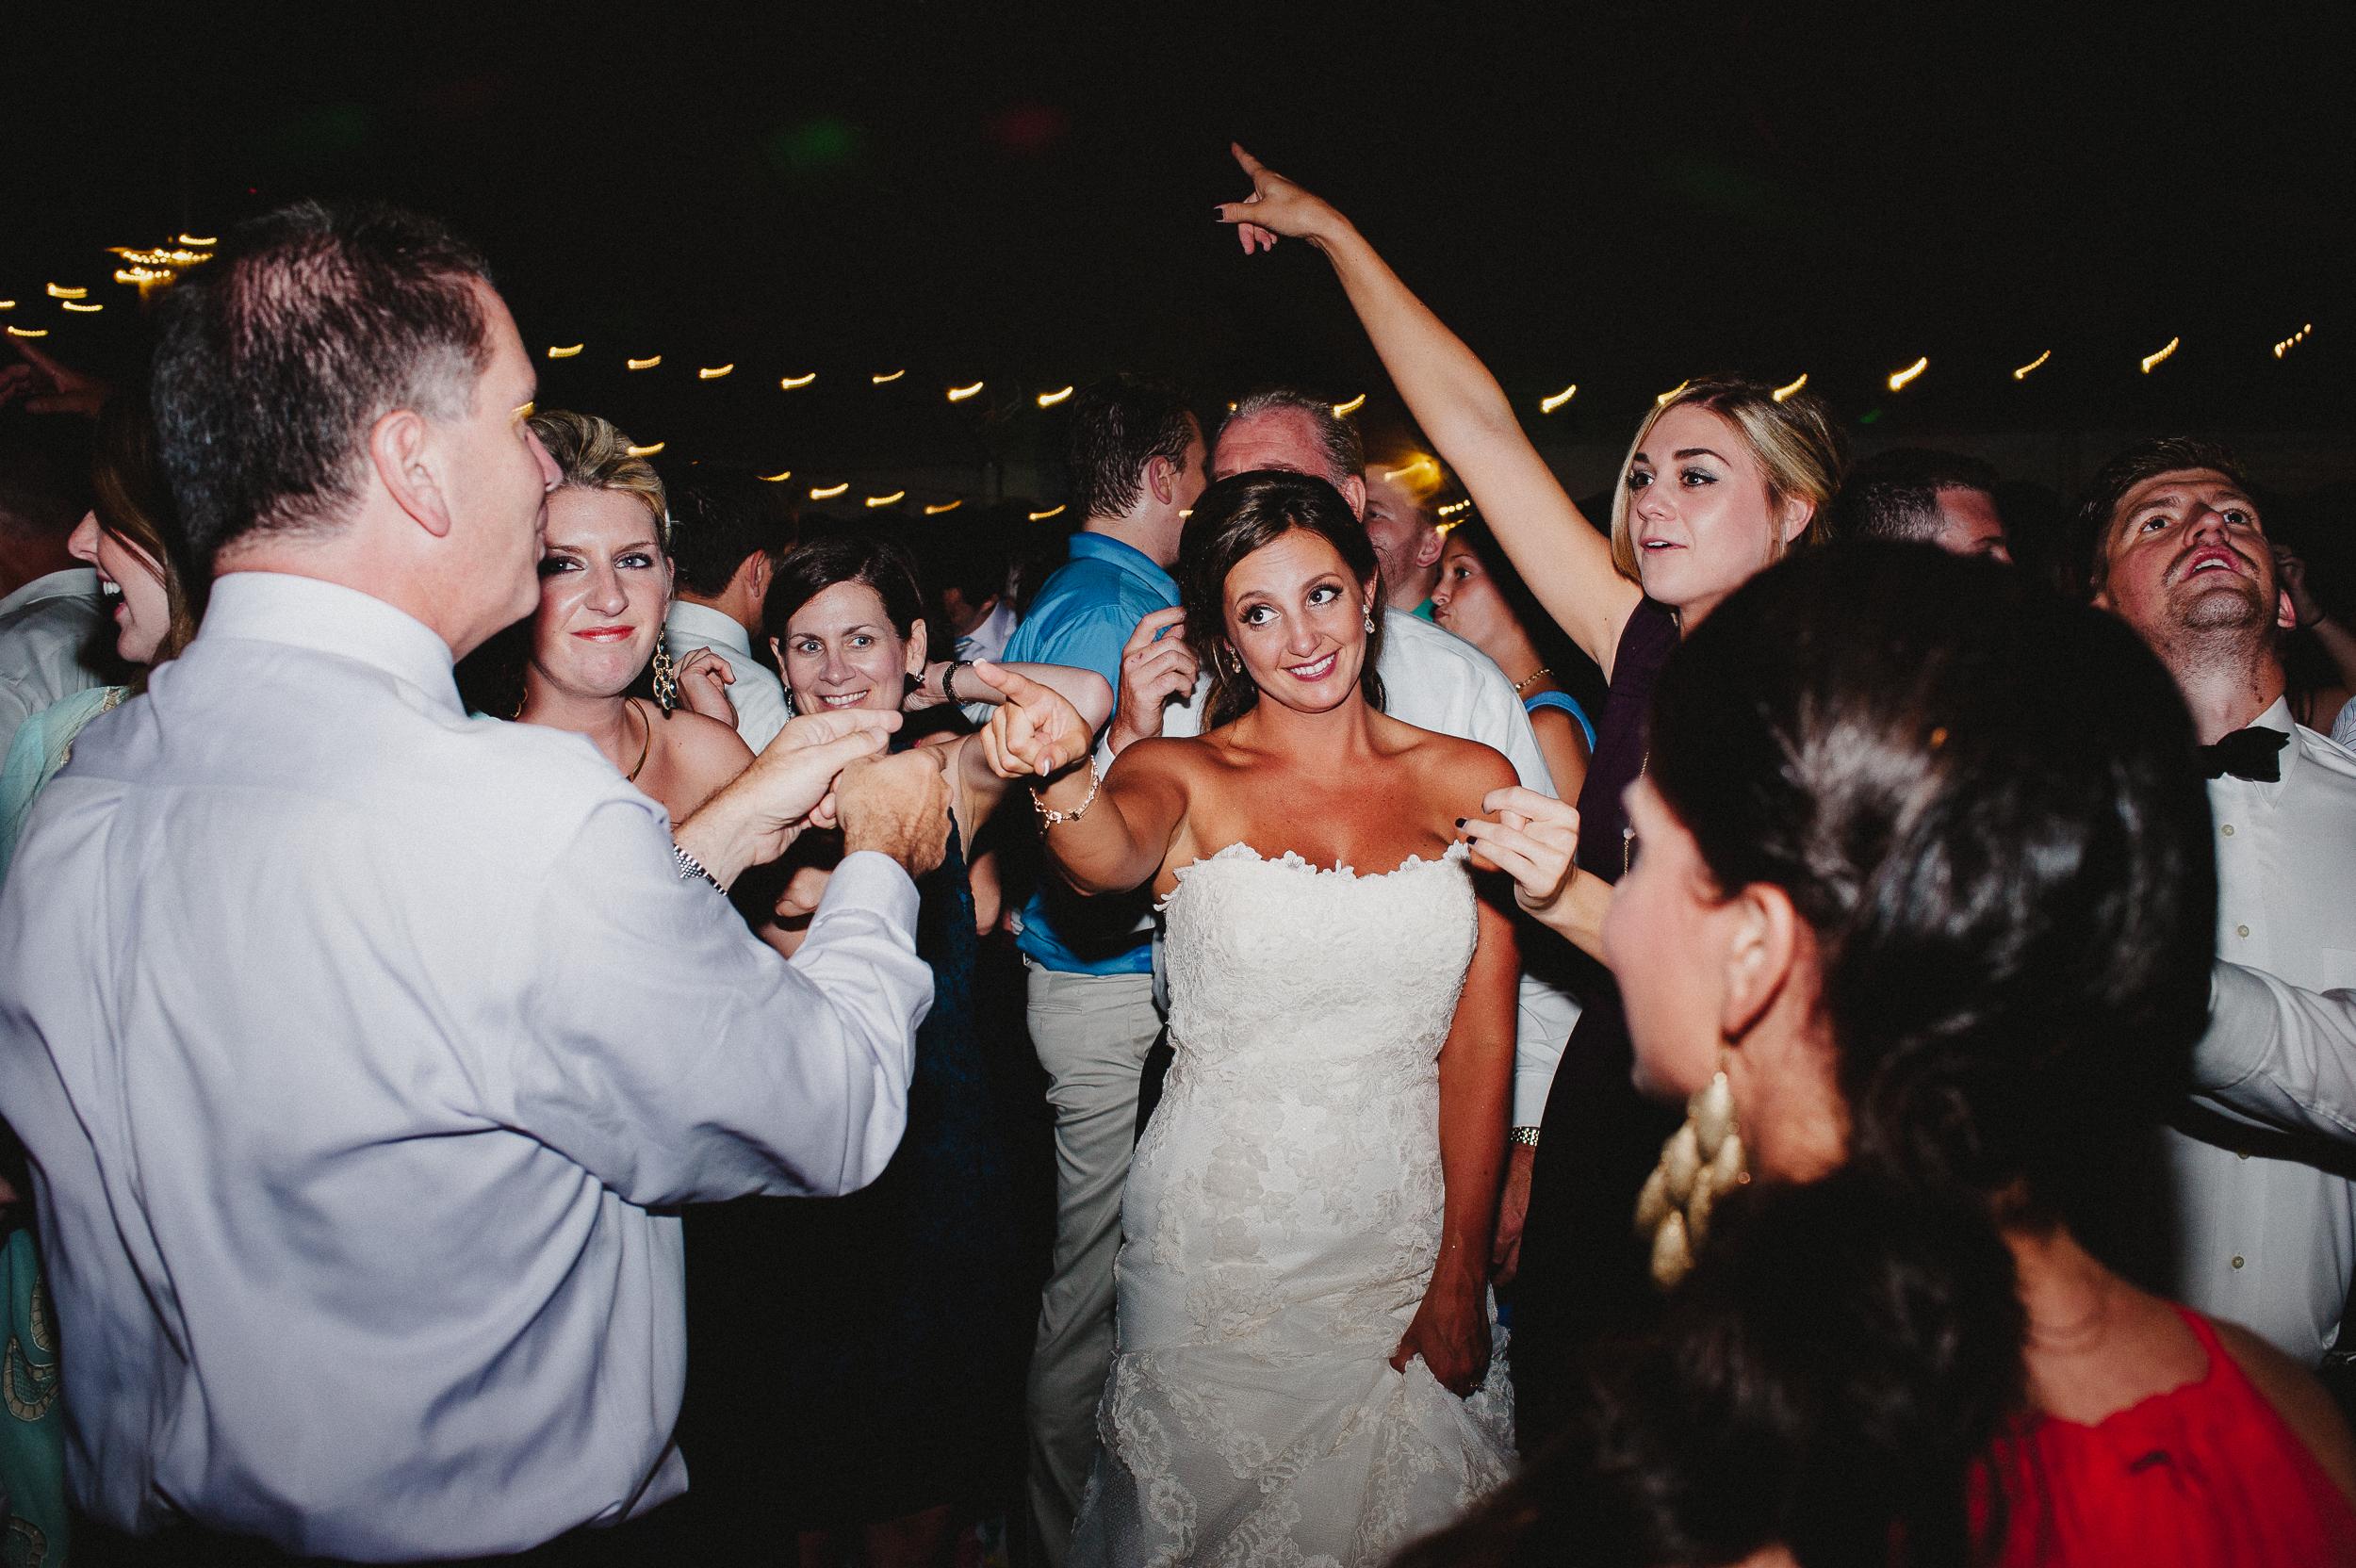 delaware-estate-wedding-photographer-pat-robinson-photography-133.jpg